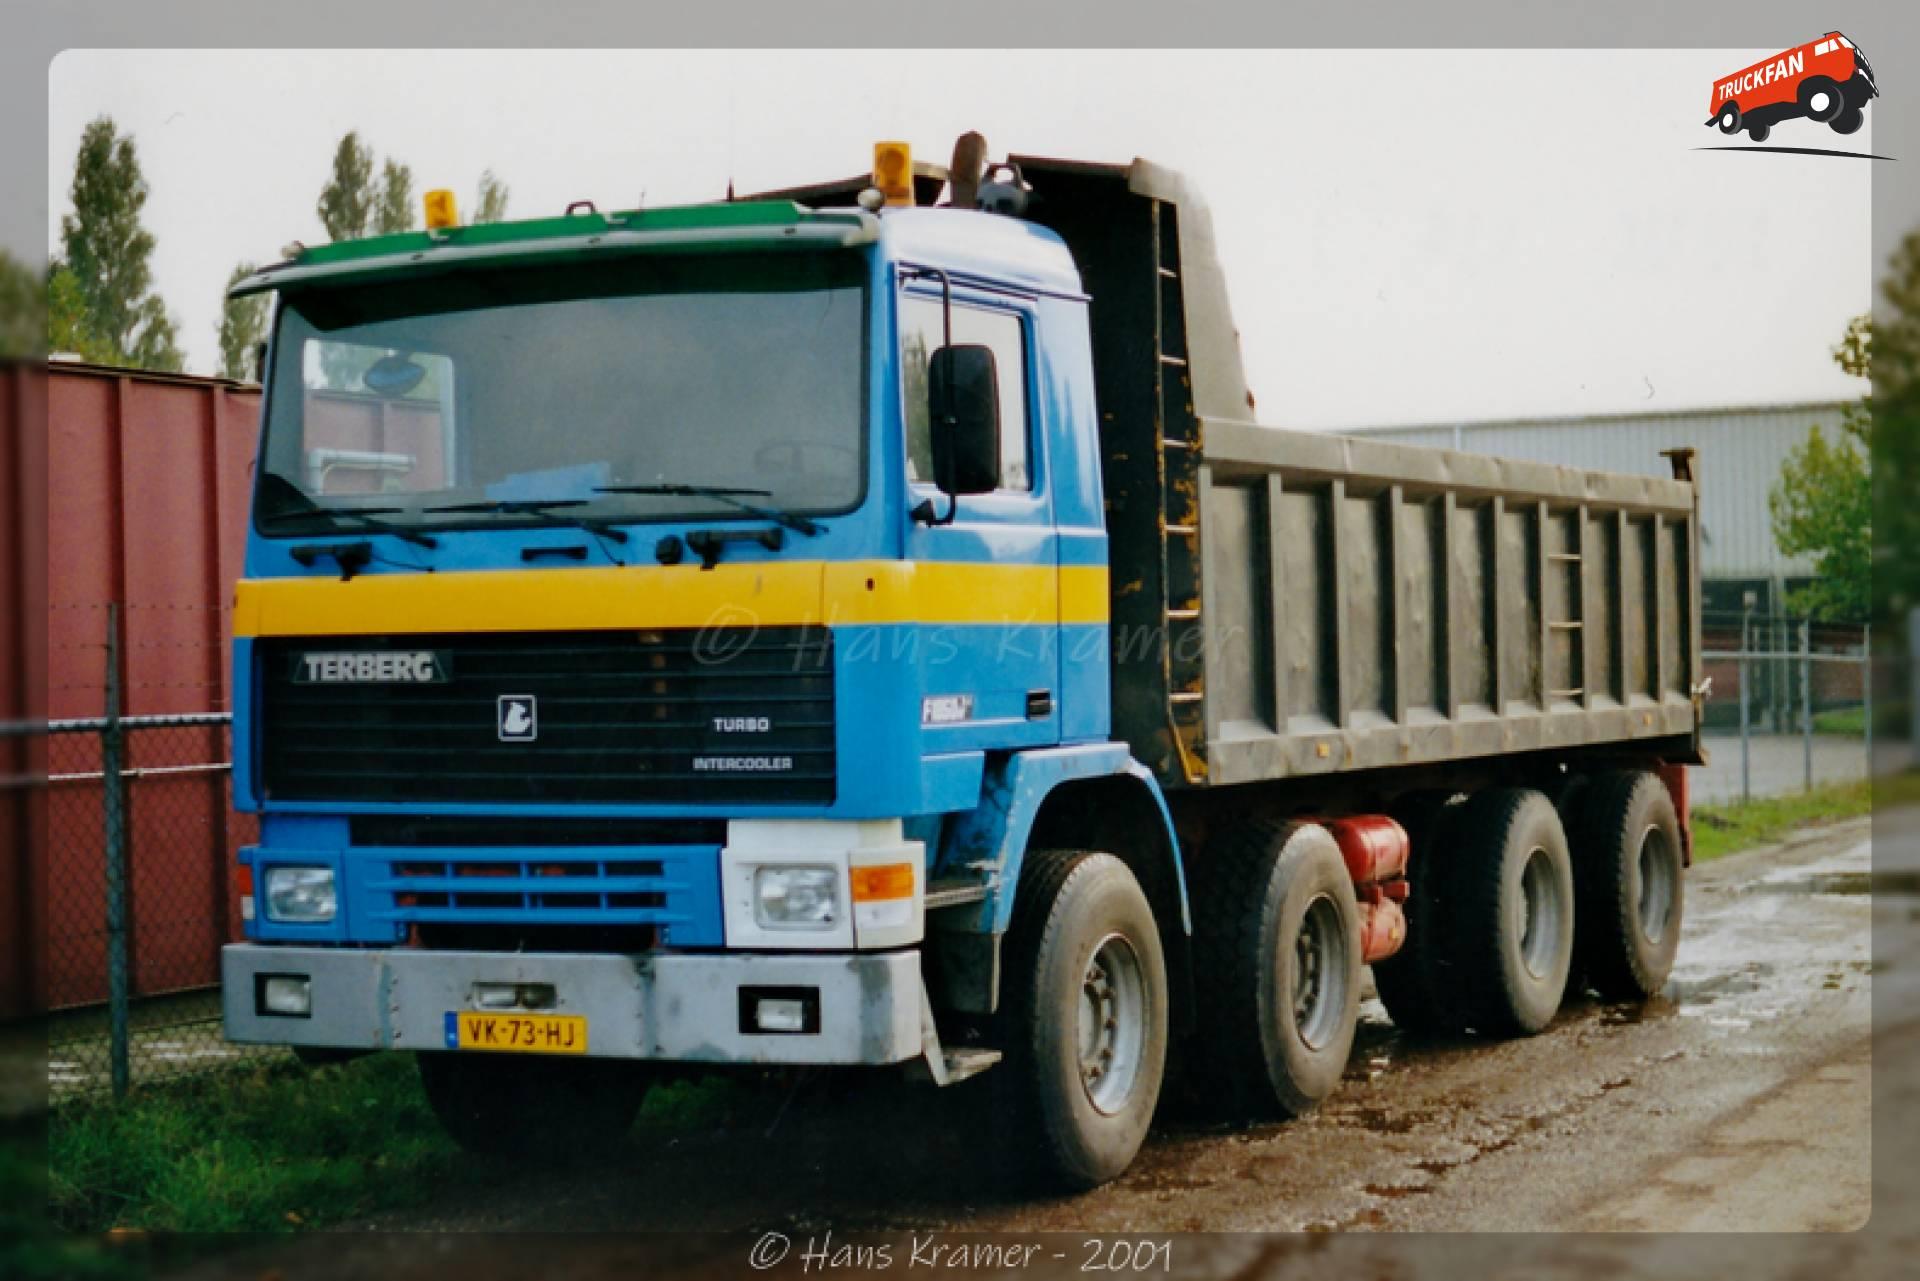 Terberg F1850